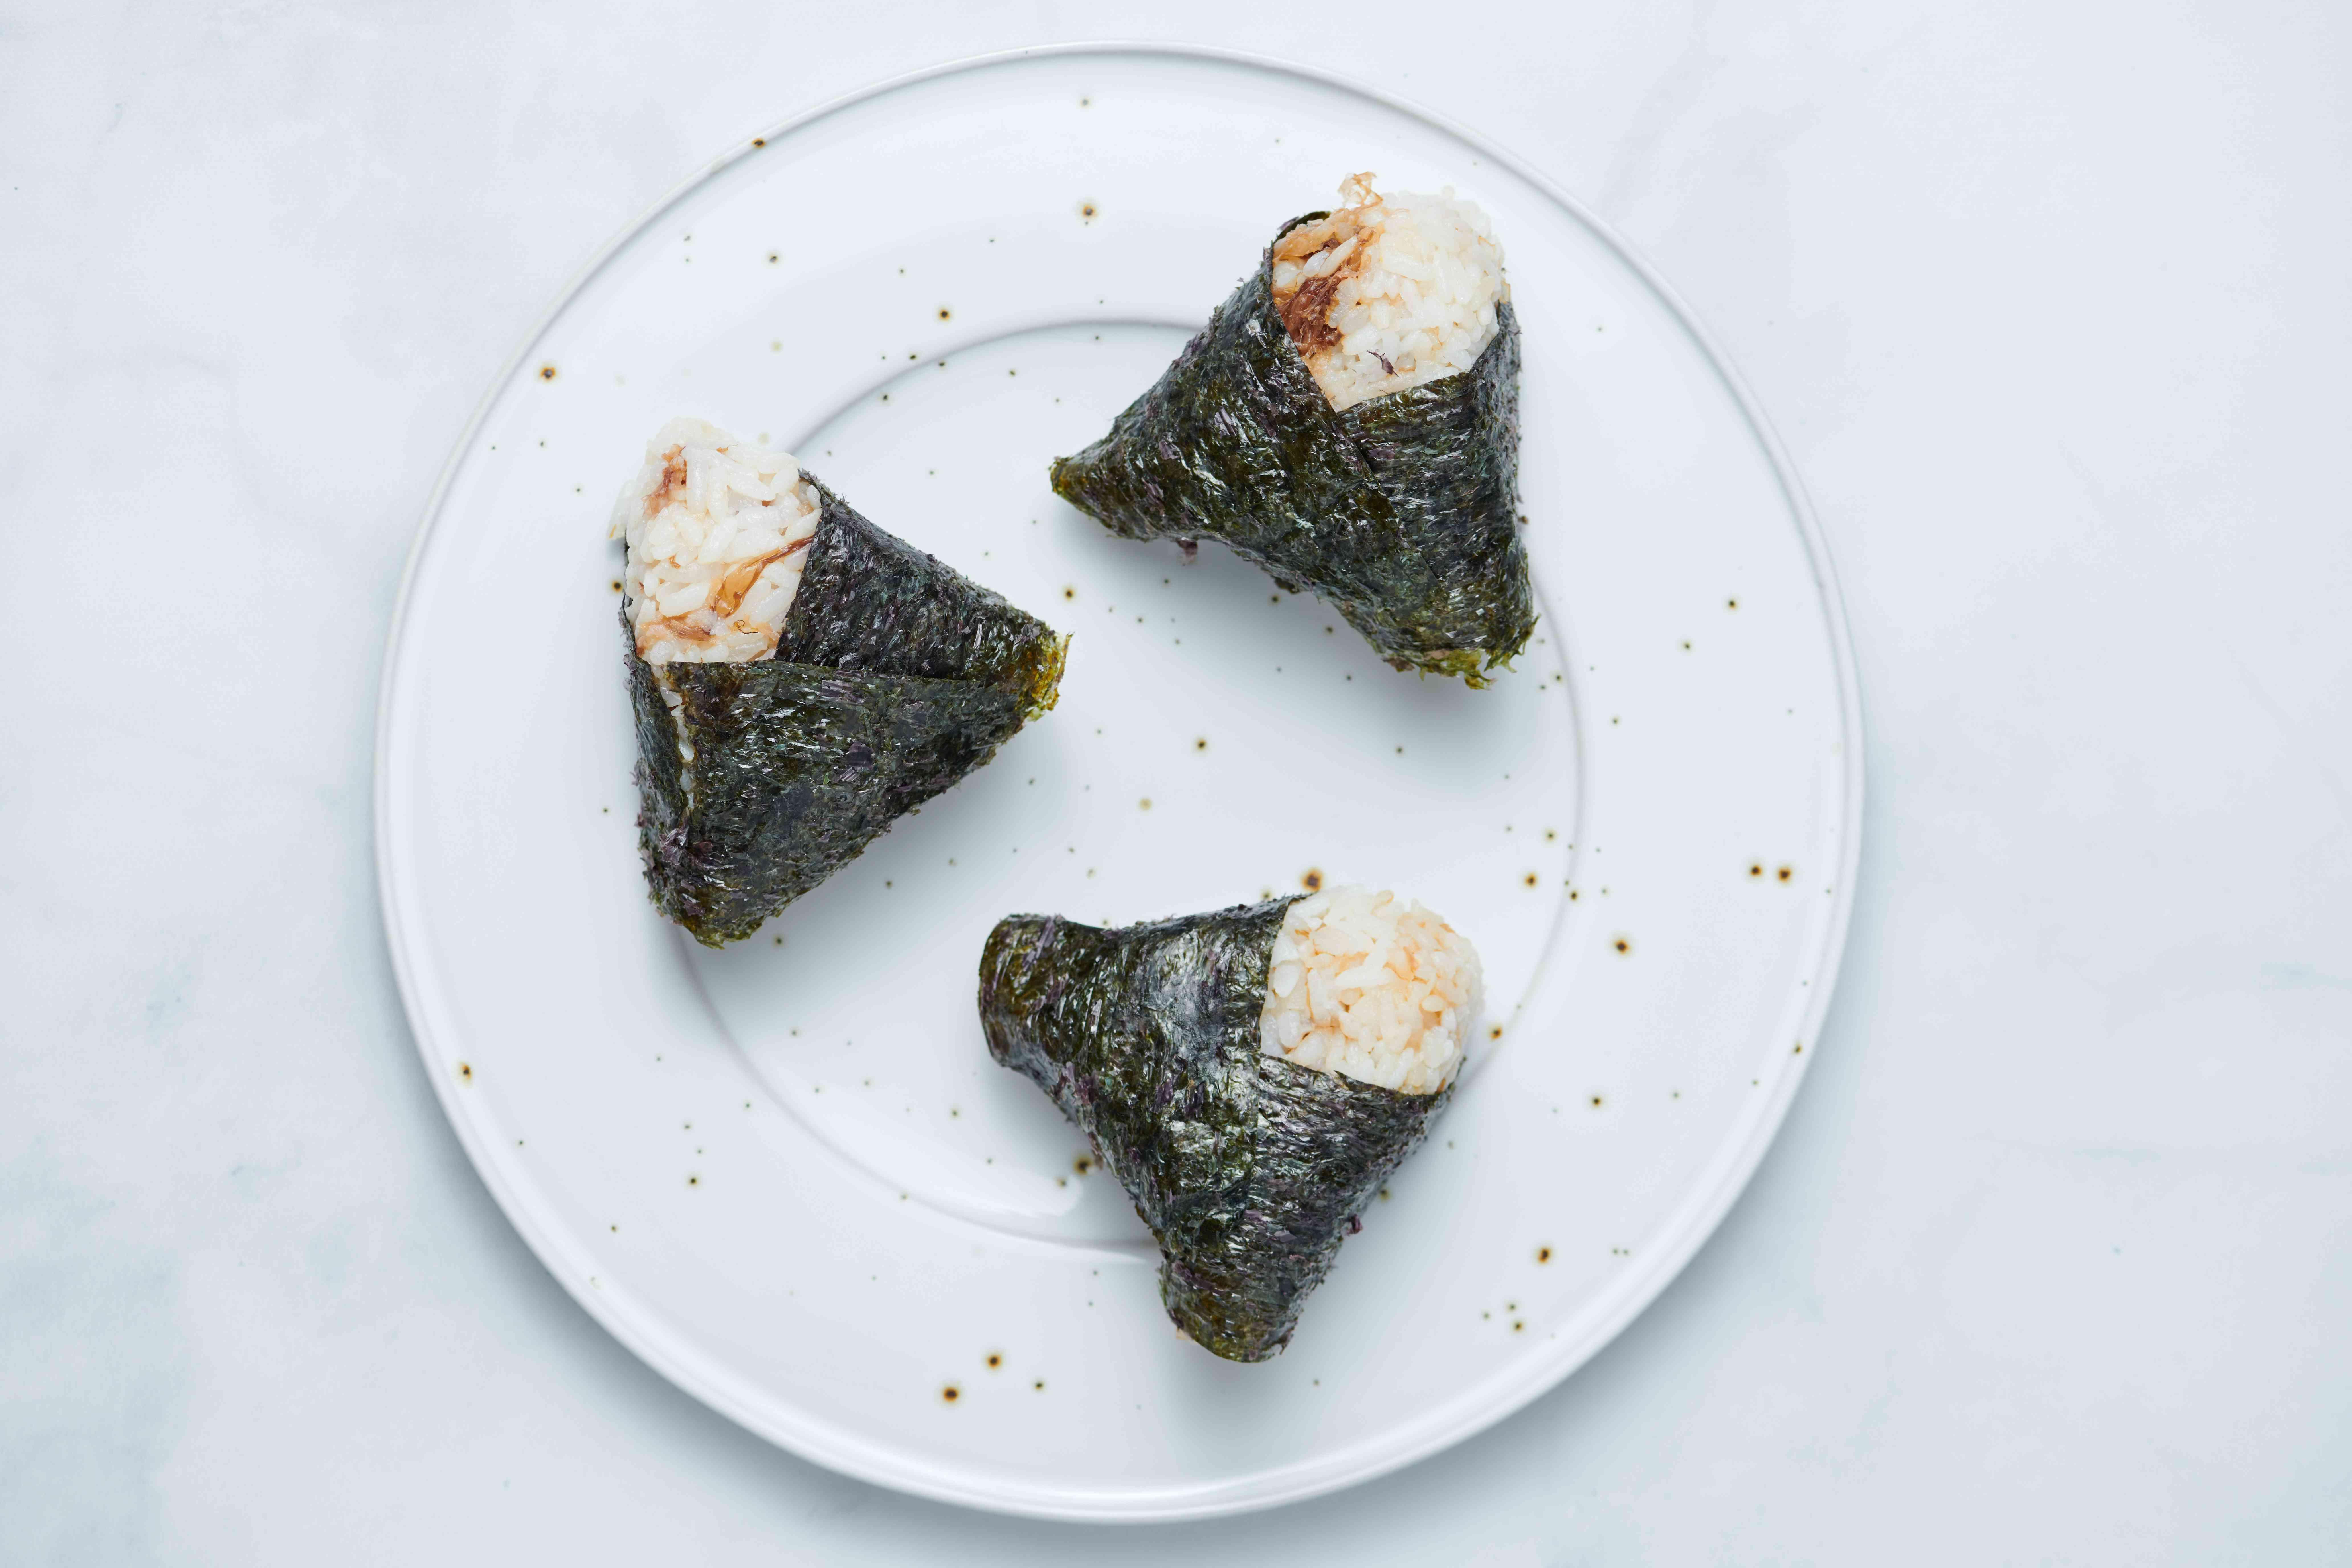 Okaka Onigiri Rice Balls on a plate